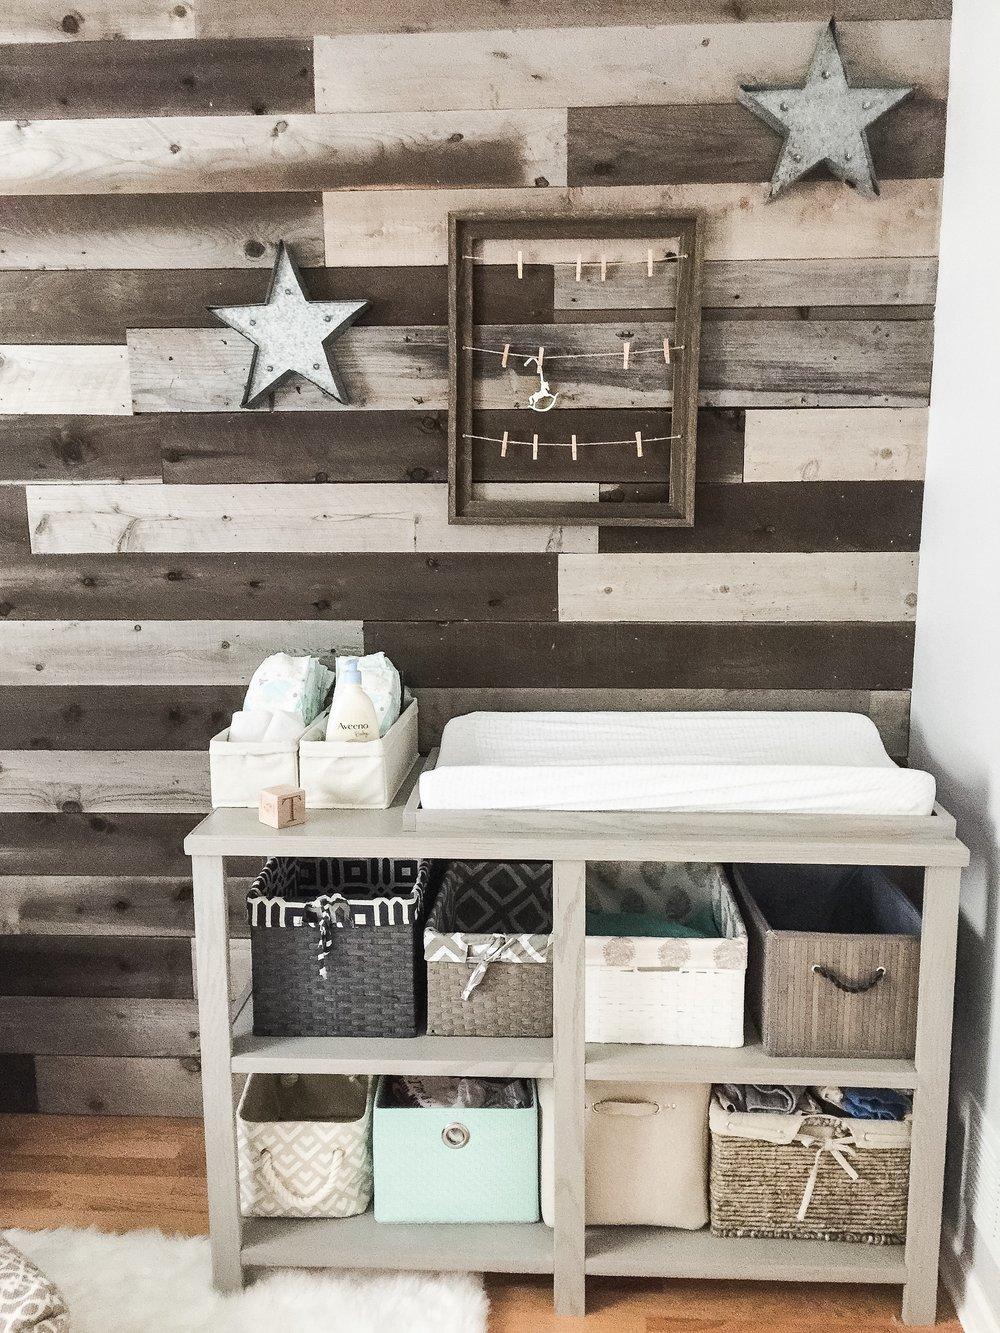 DIY Wooden Changing Table with Basket Storage. How to design a gender neutral nursery. Nursery decor for a boy or girl. #nurserydecor #nurserydesign #genderneutral